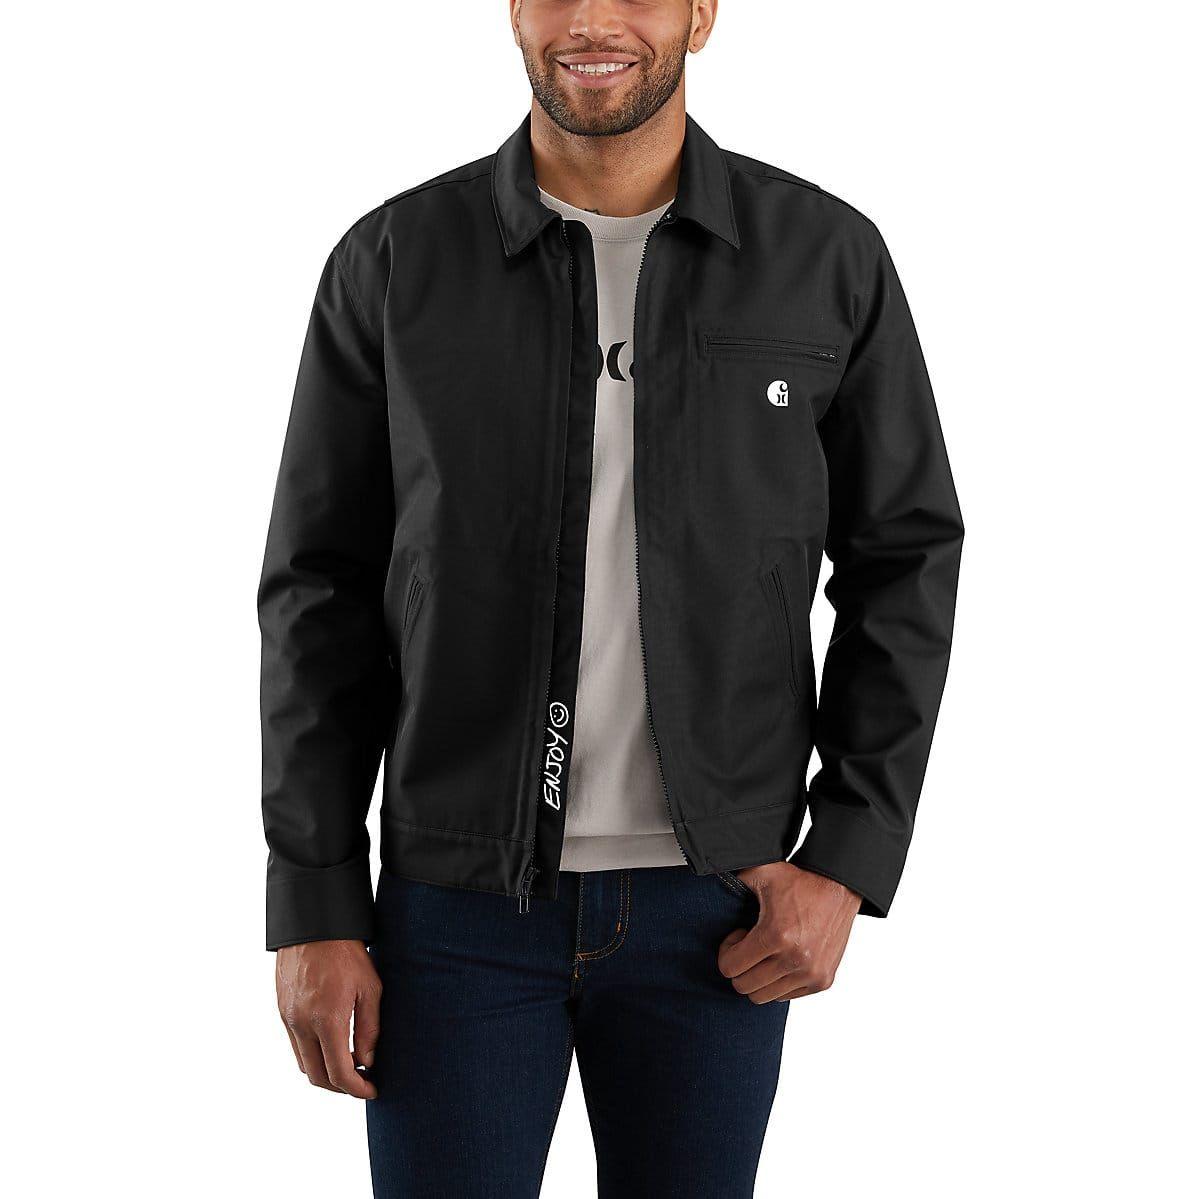 Unisex Hurley X Carhartt Classic Workwear Jacket Bv2697 Carhartt Jackets Unisex Jacket Work Wear [ 1199 x 1200 Pixel ]